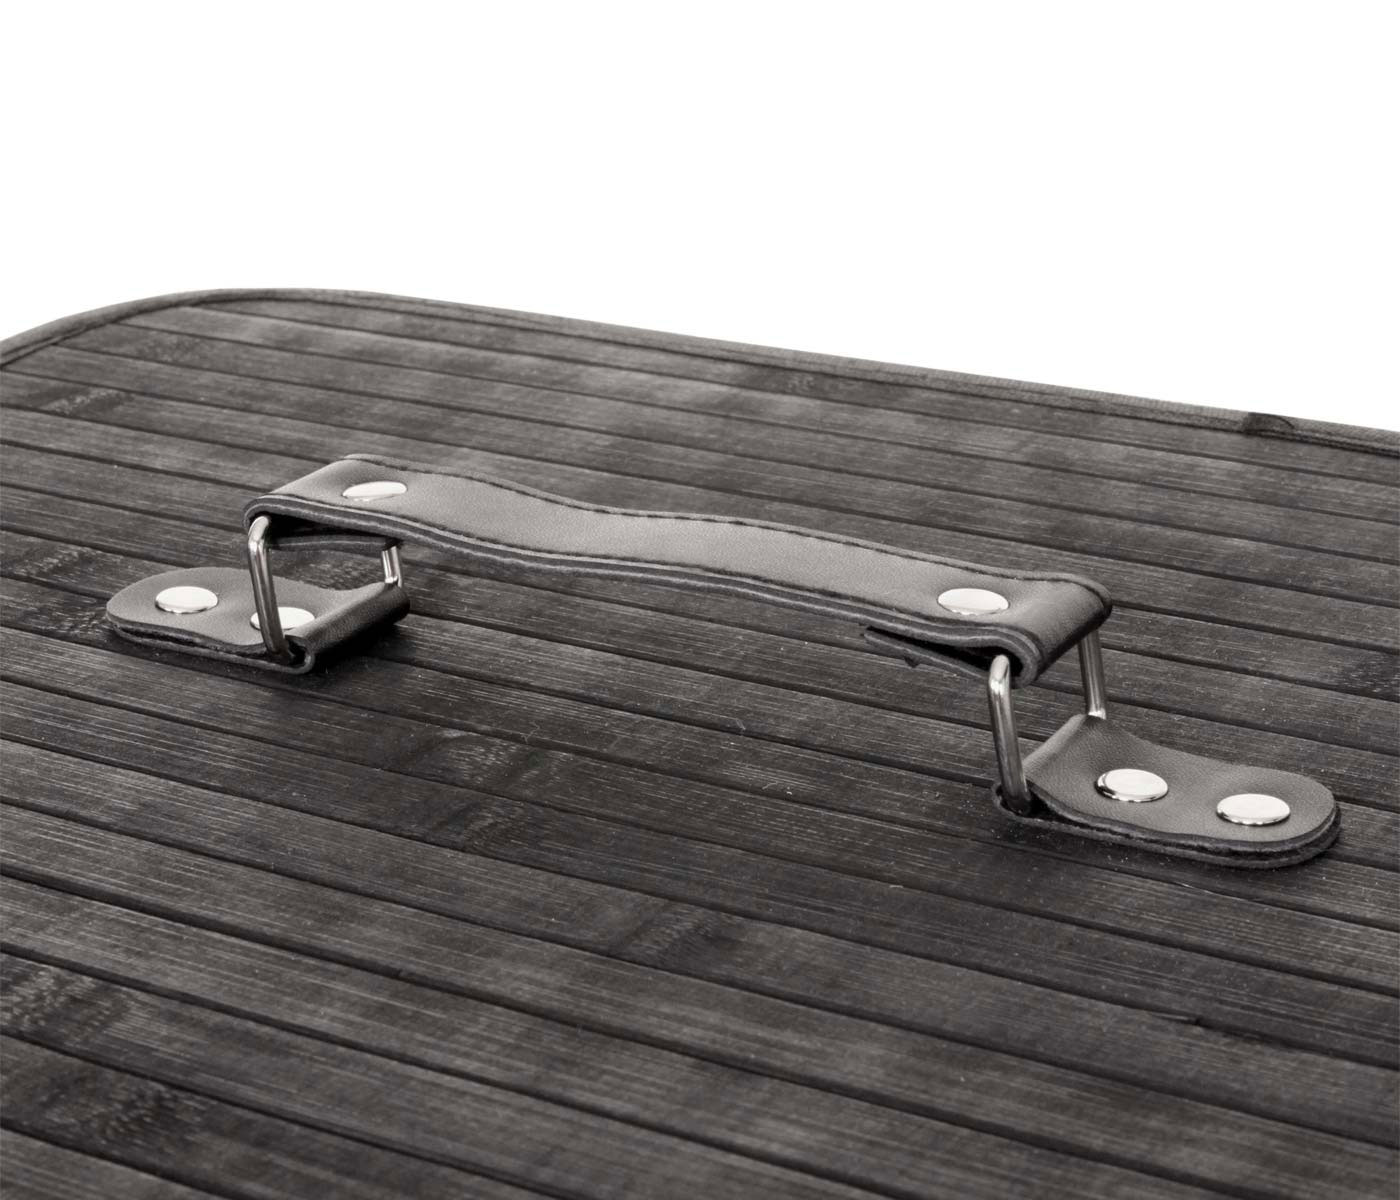 w schekorb laundry bambus 2 f cher schwarz. Black Bedroom Furniture Sets. Home Design Ideas